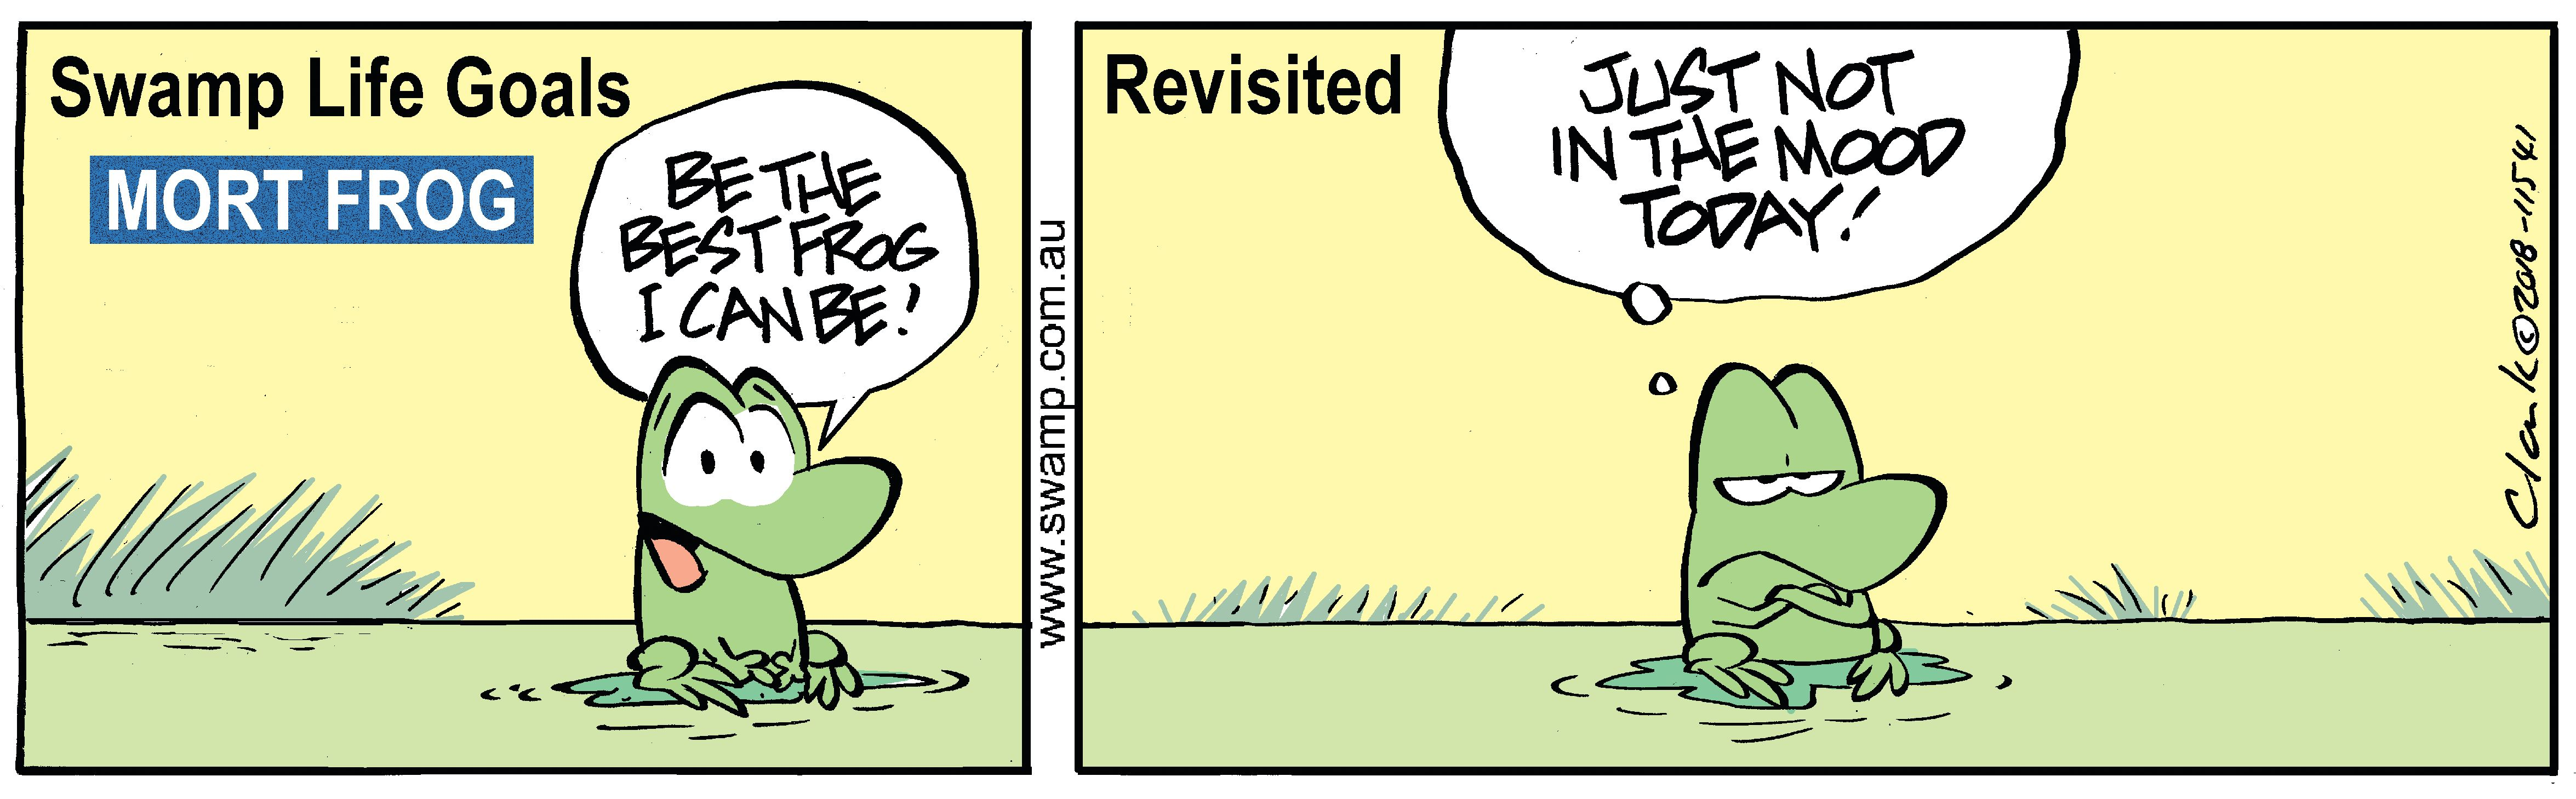 Mort Frog Bad Mood Comic